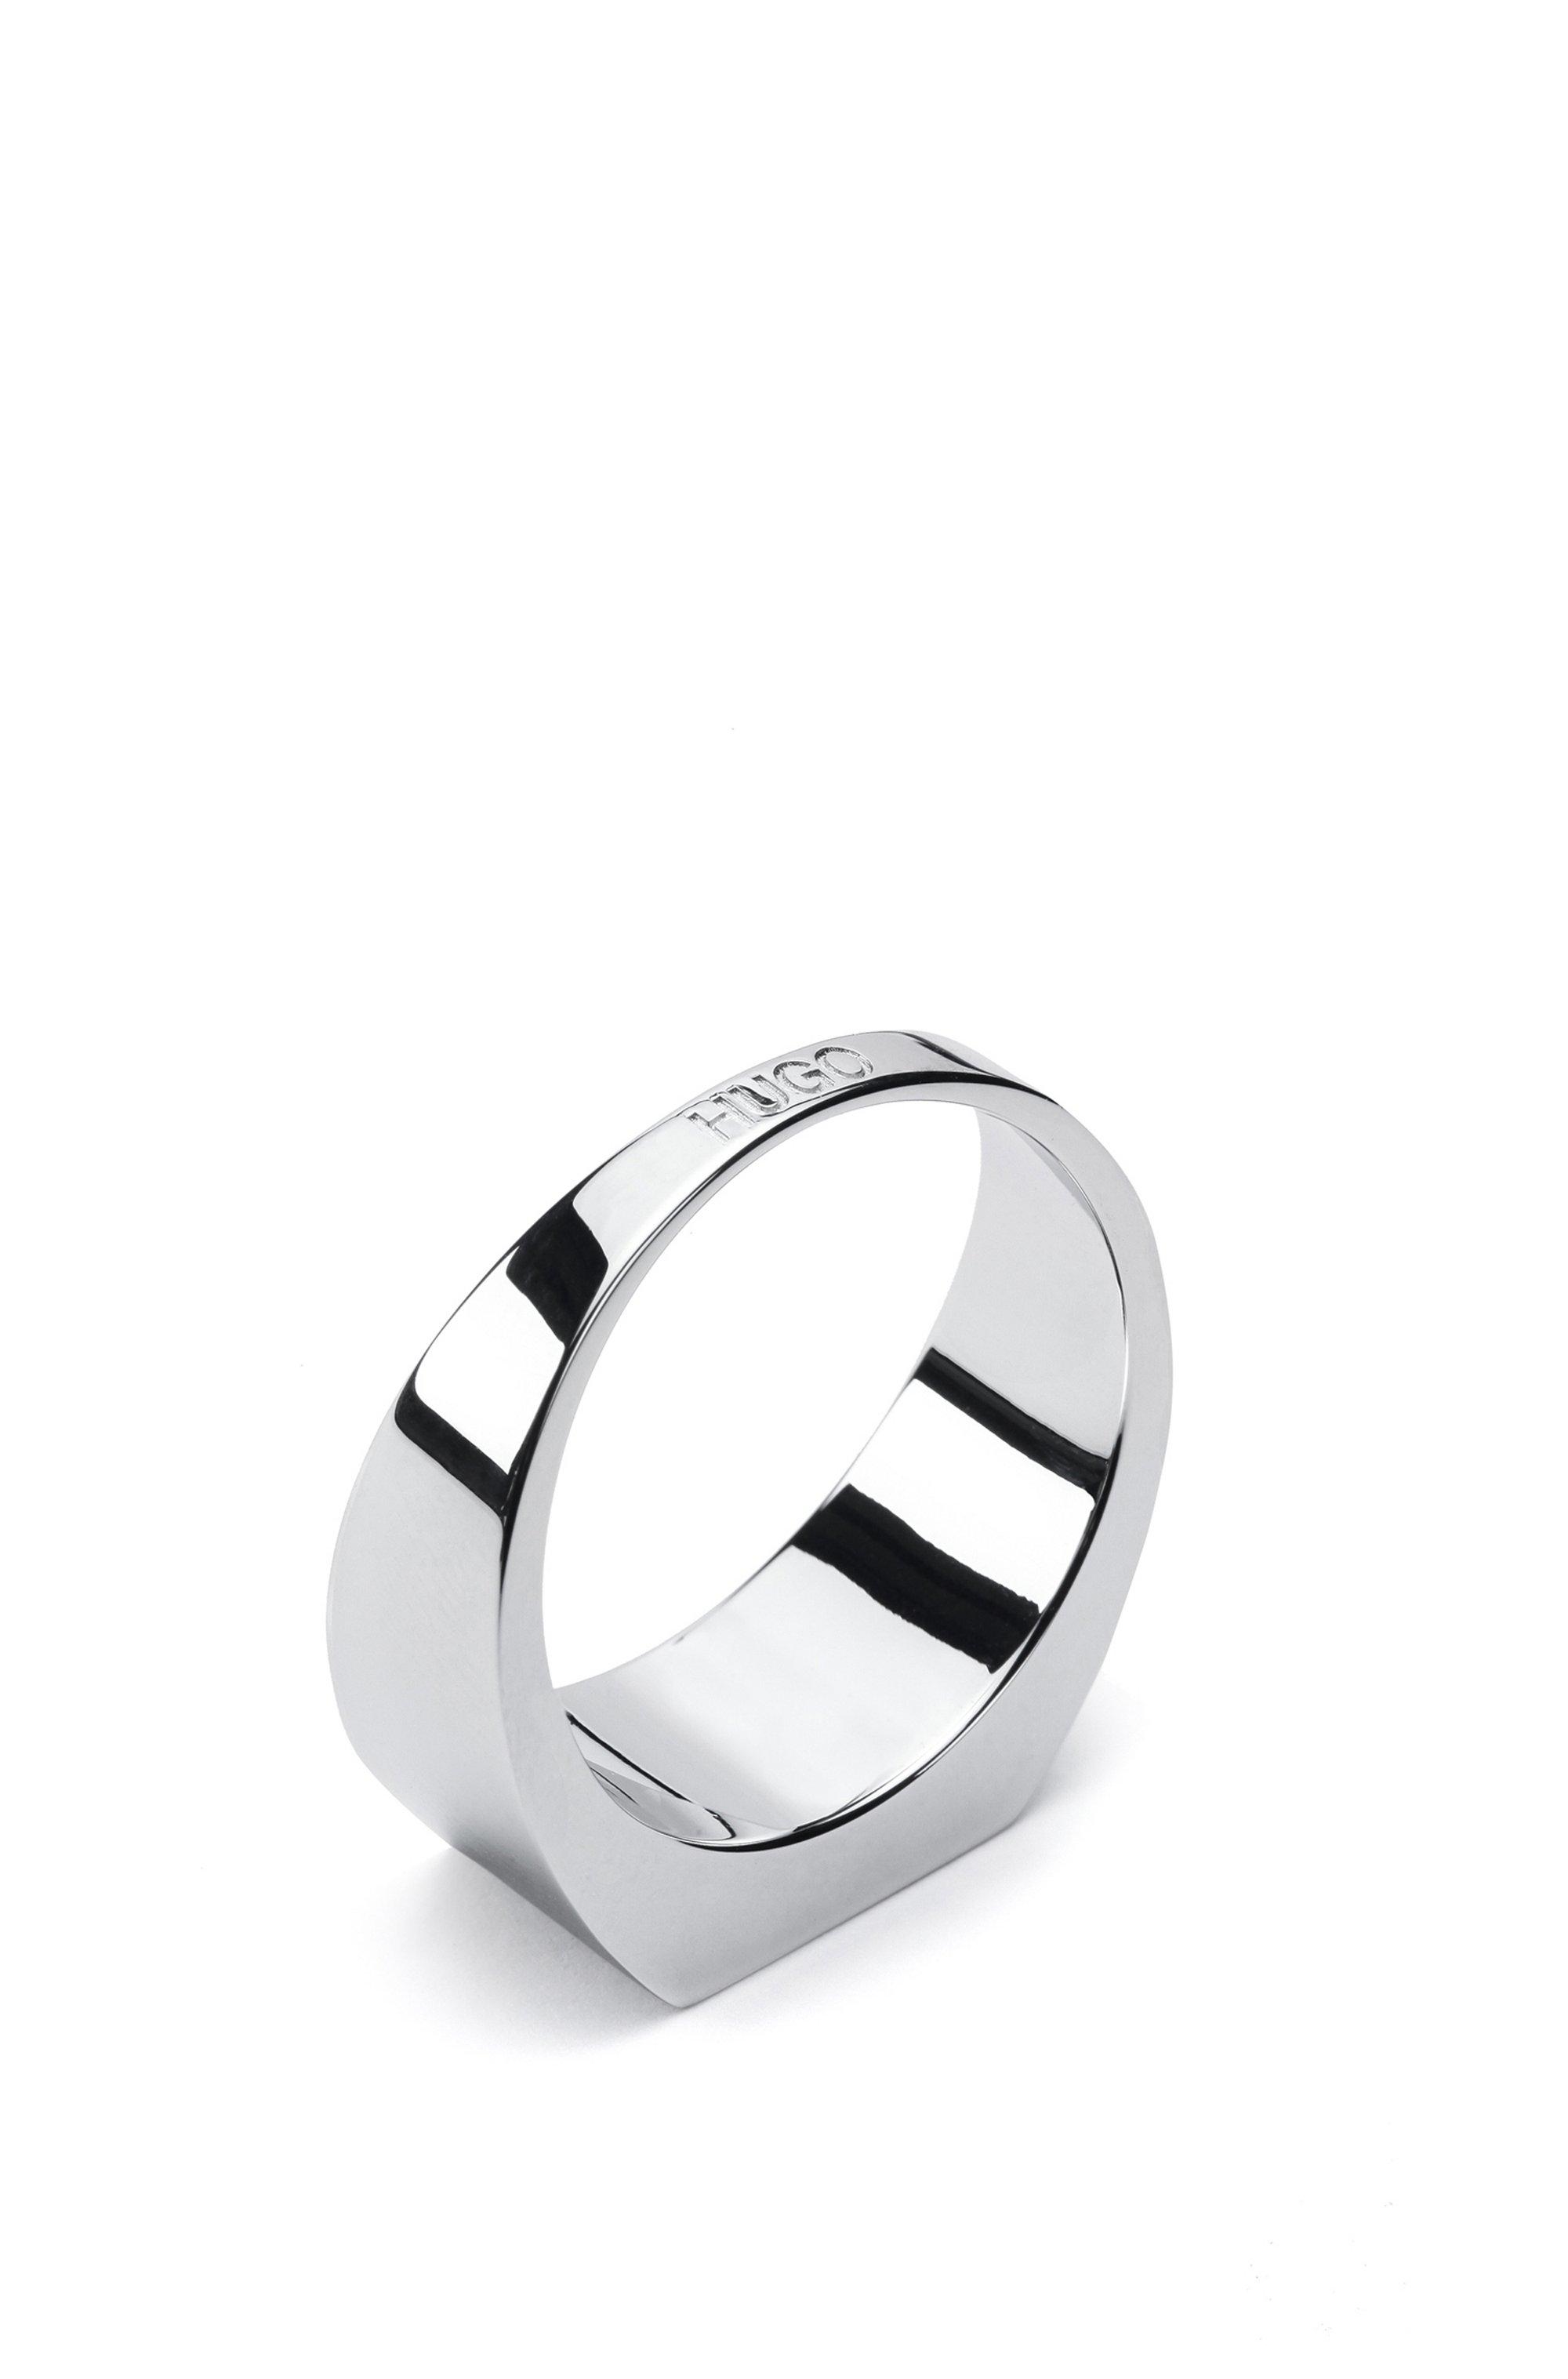 Polished brass ring with black enamel insert